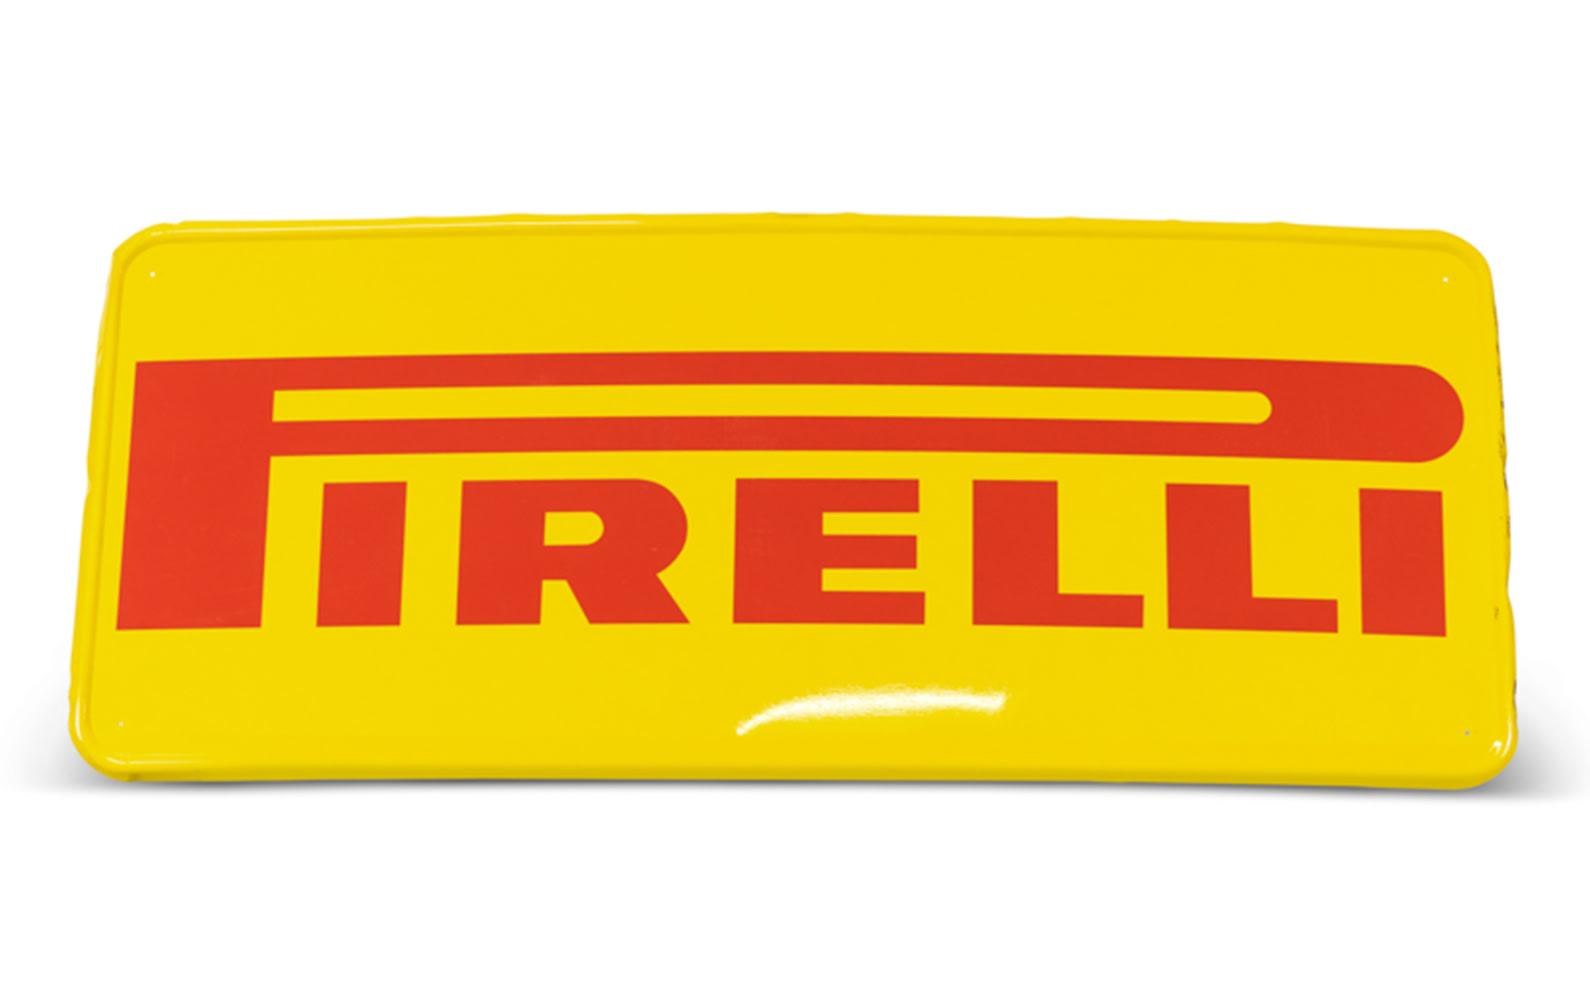 Pirelli Tire Sign